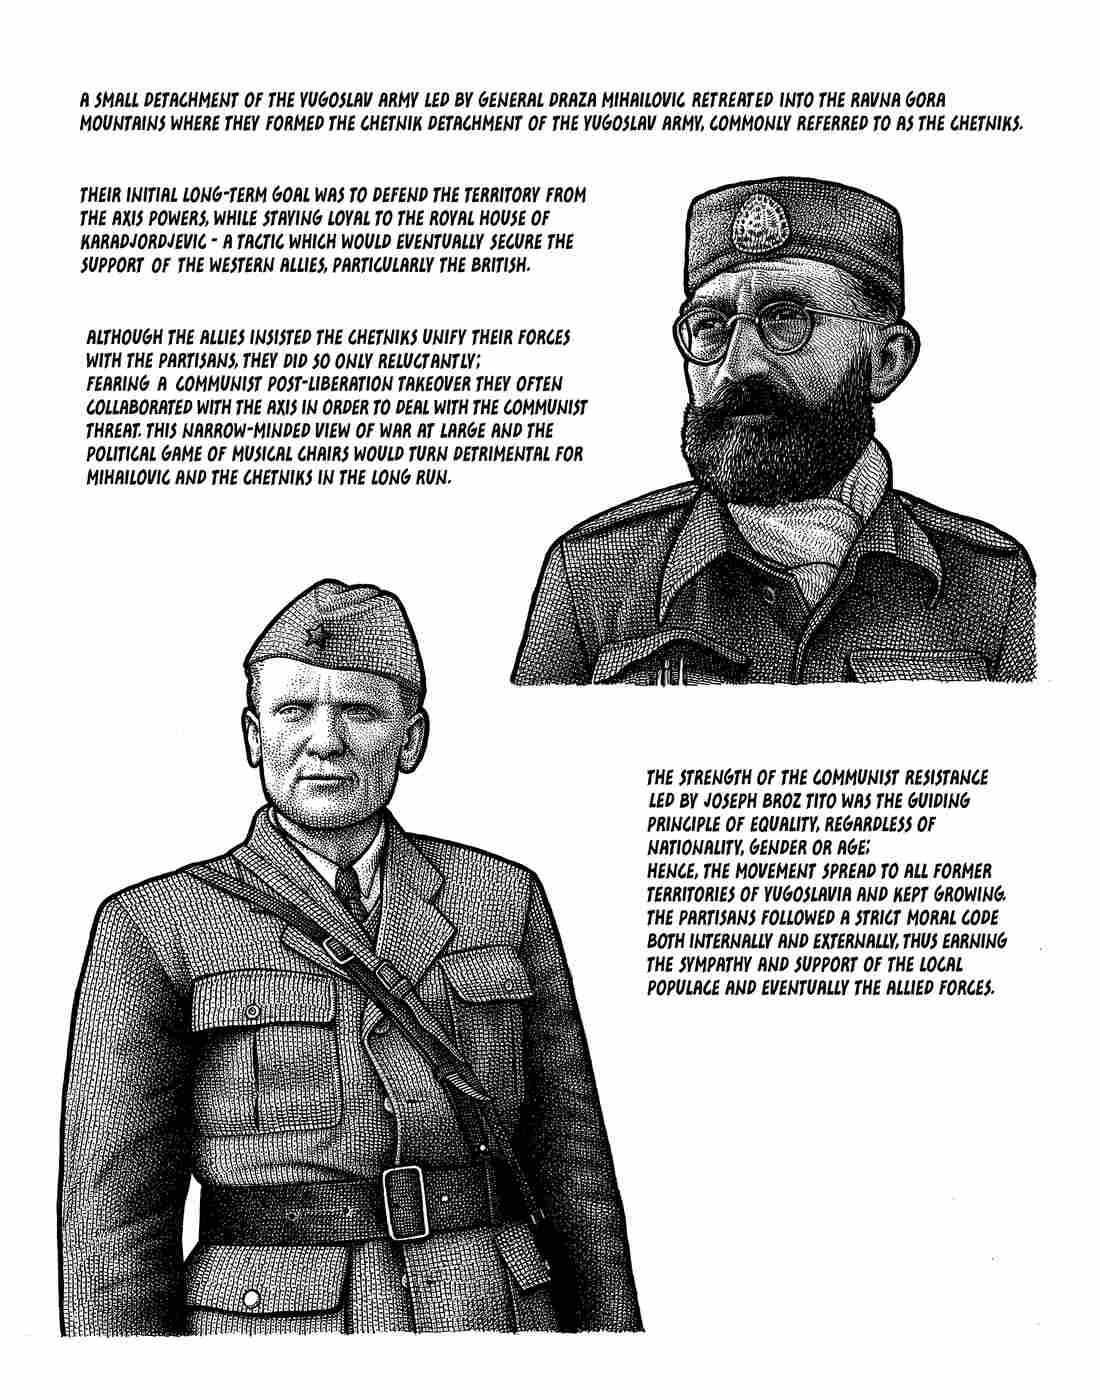 Fatherland pg. 76